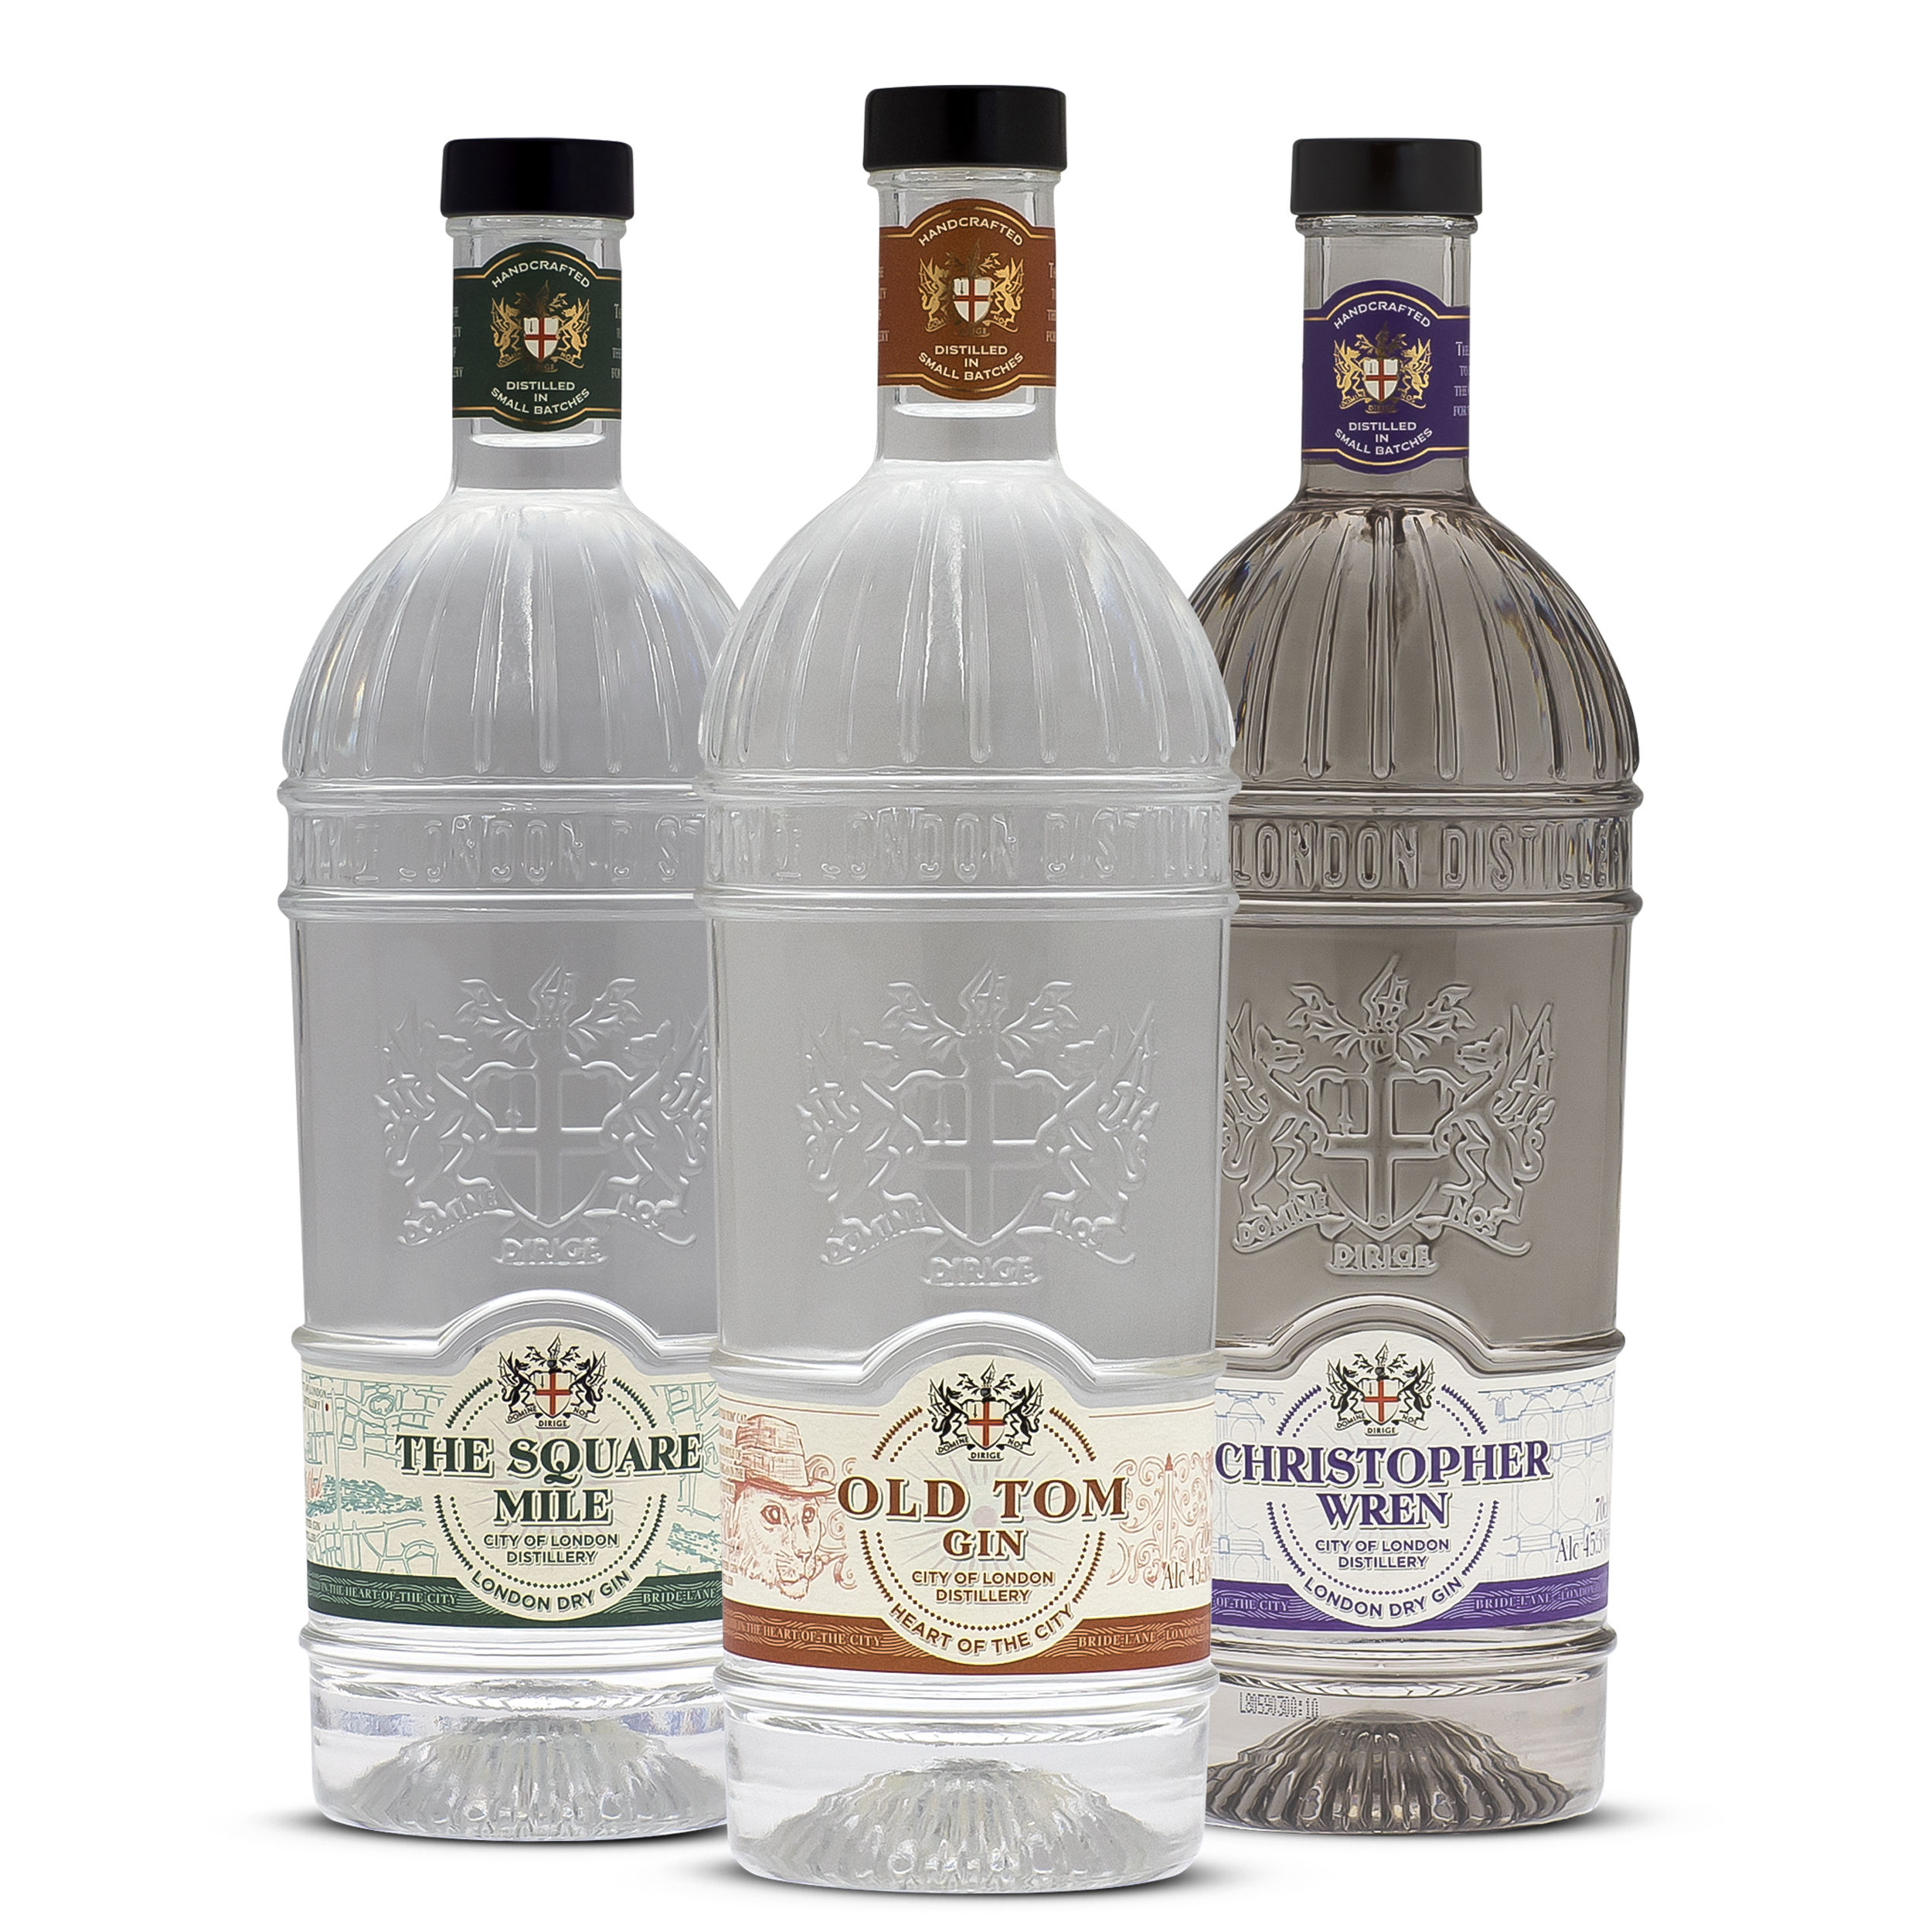 City of London Distillery Gin